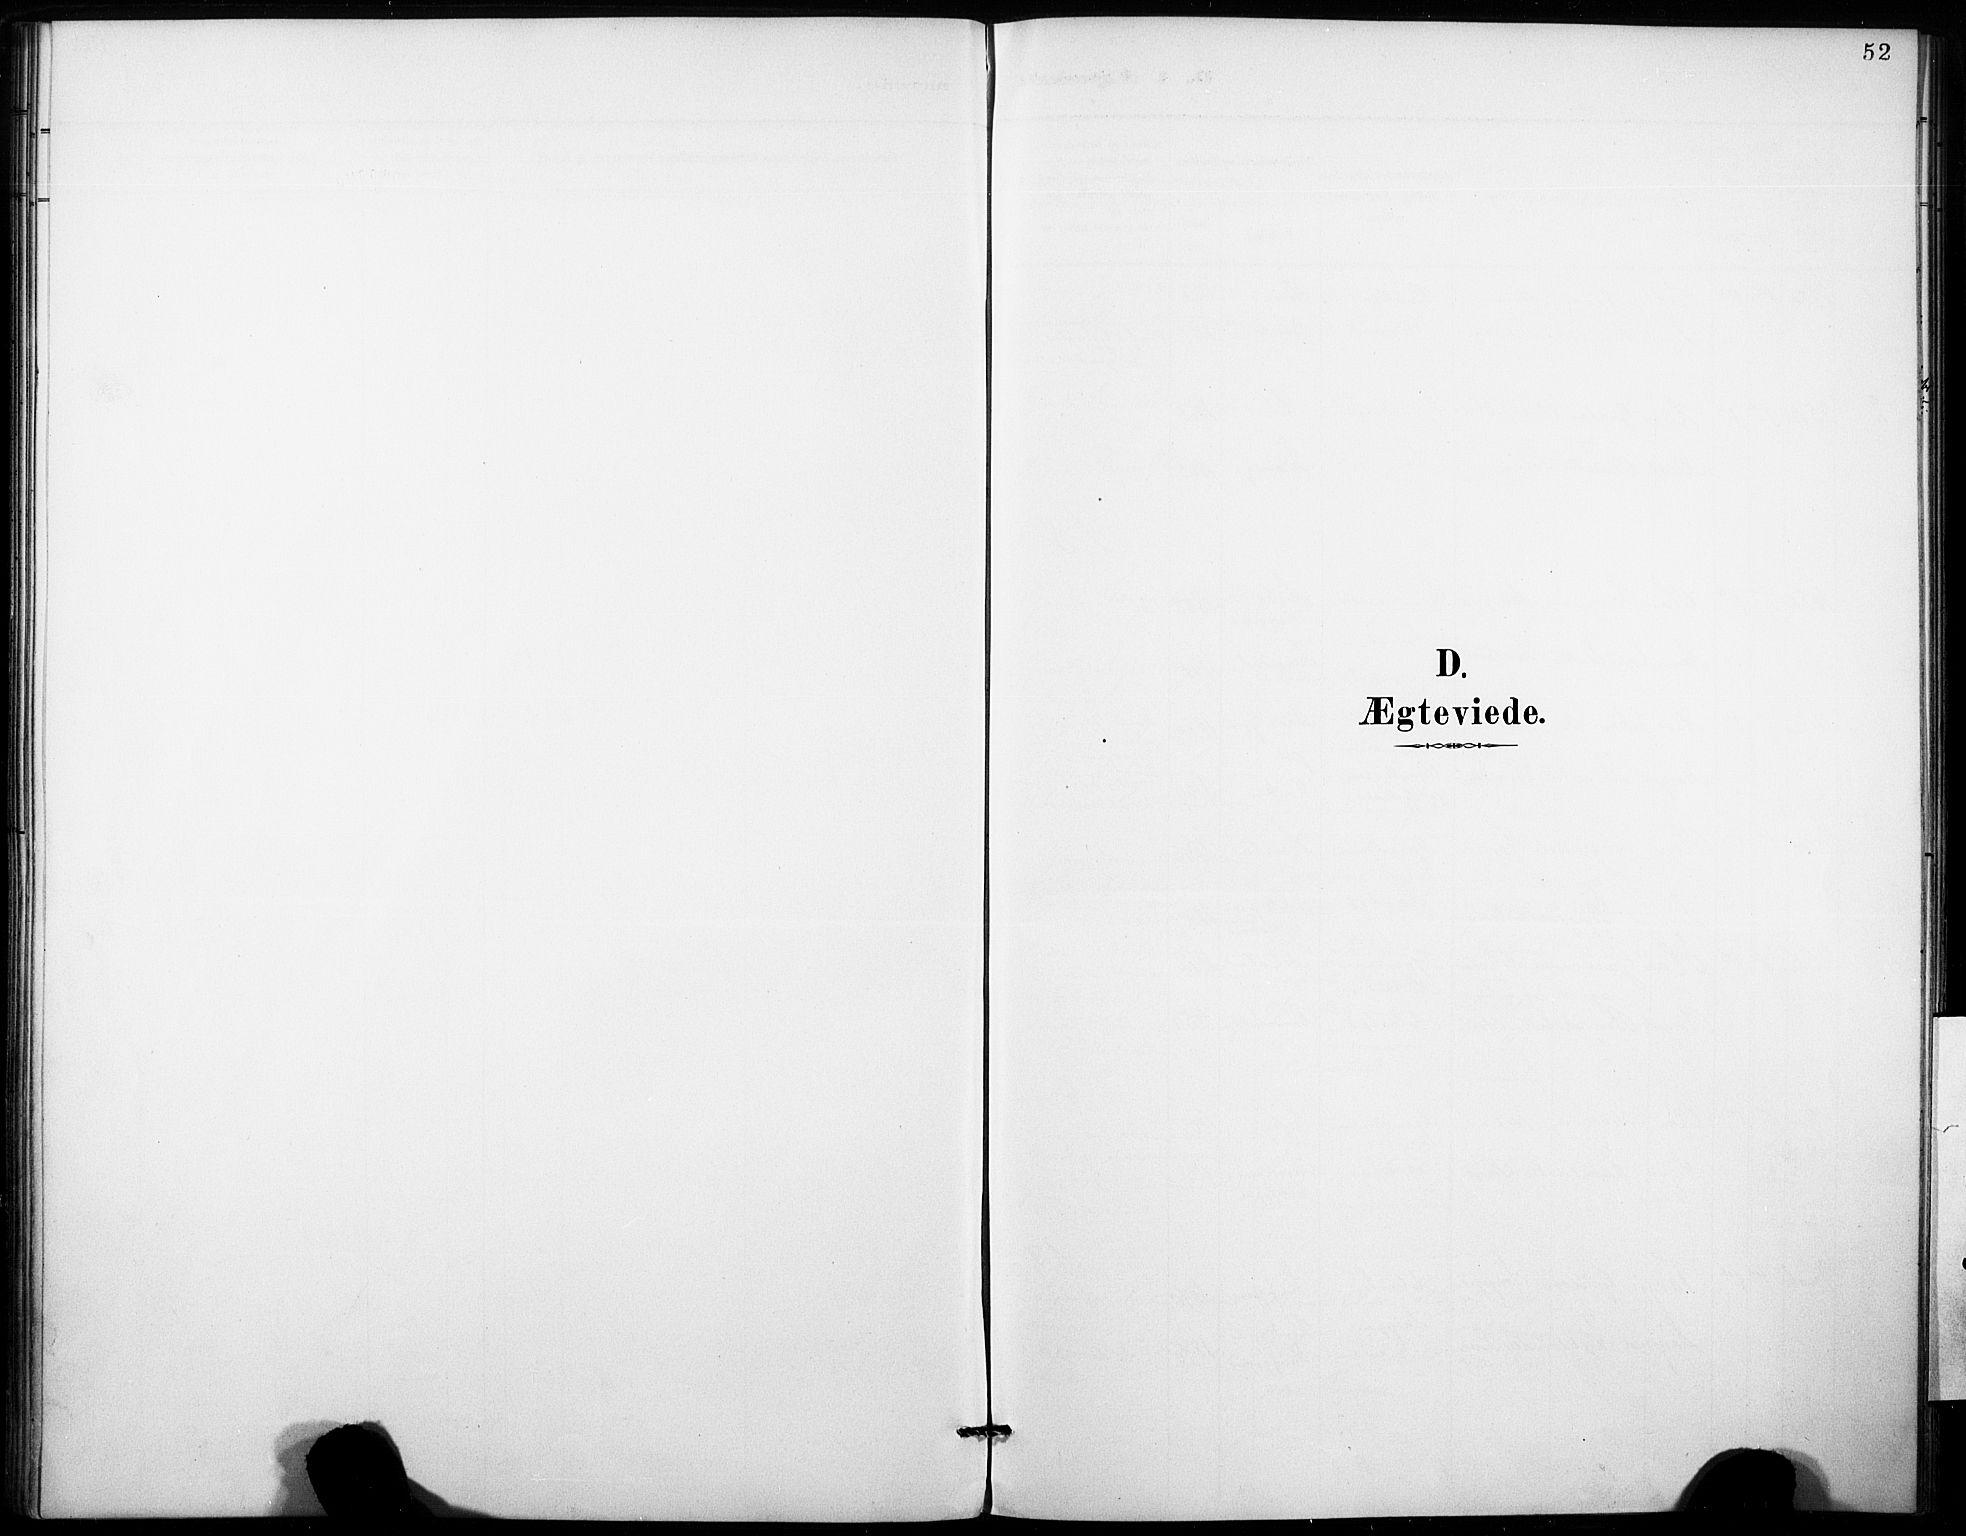 SAKO, Fyresdal kirkebøker, F/Fb/L0003: Ministerialbok nr. II 3, 1887-1903, s. 52